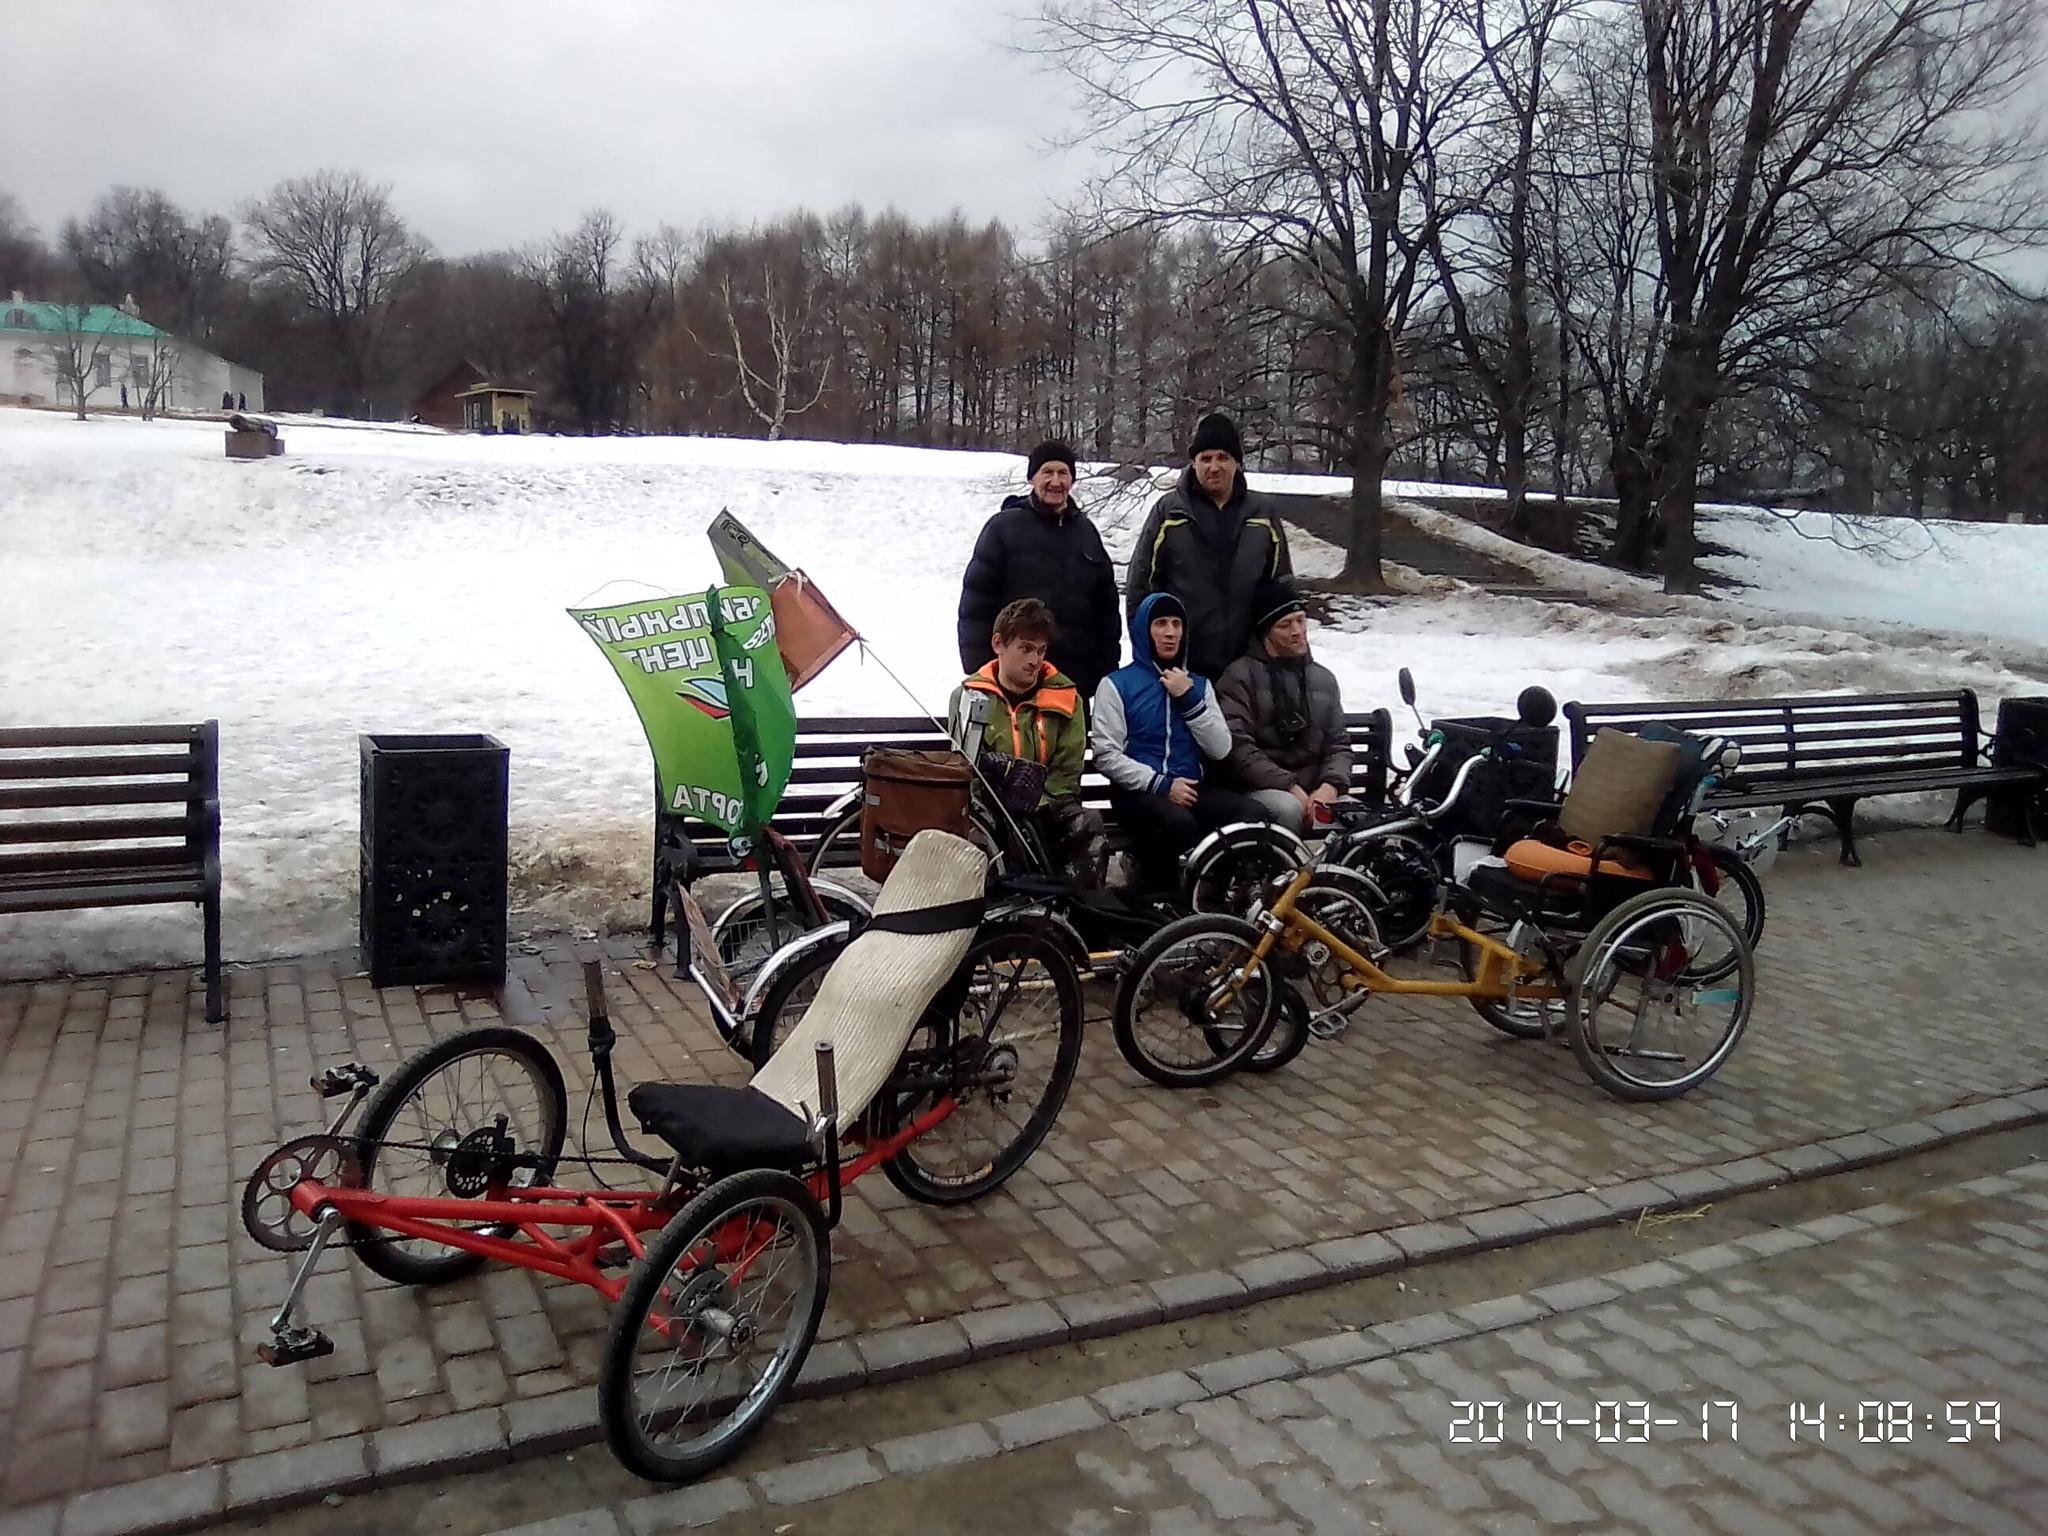 https://content.foto.my.mail.ru/list/maxnev/syzdalchev/h-309.jpg